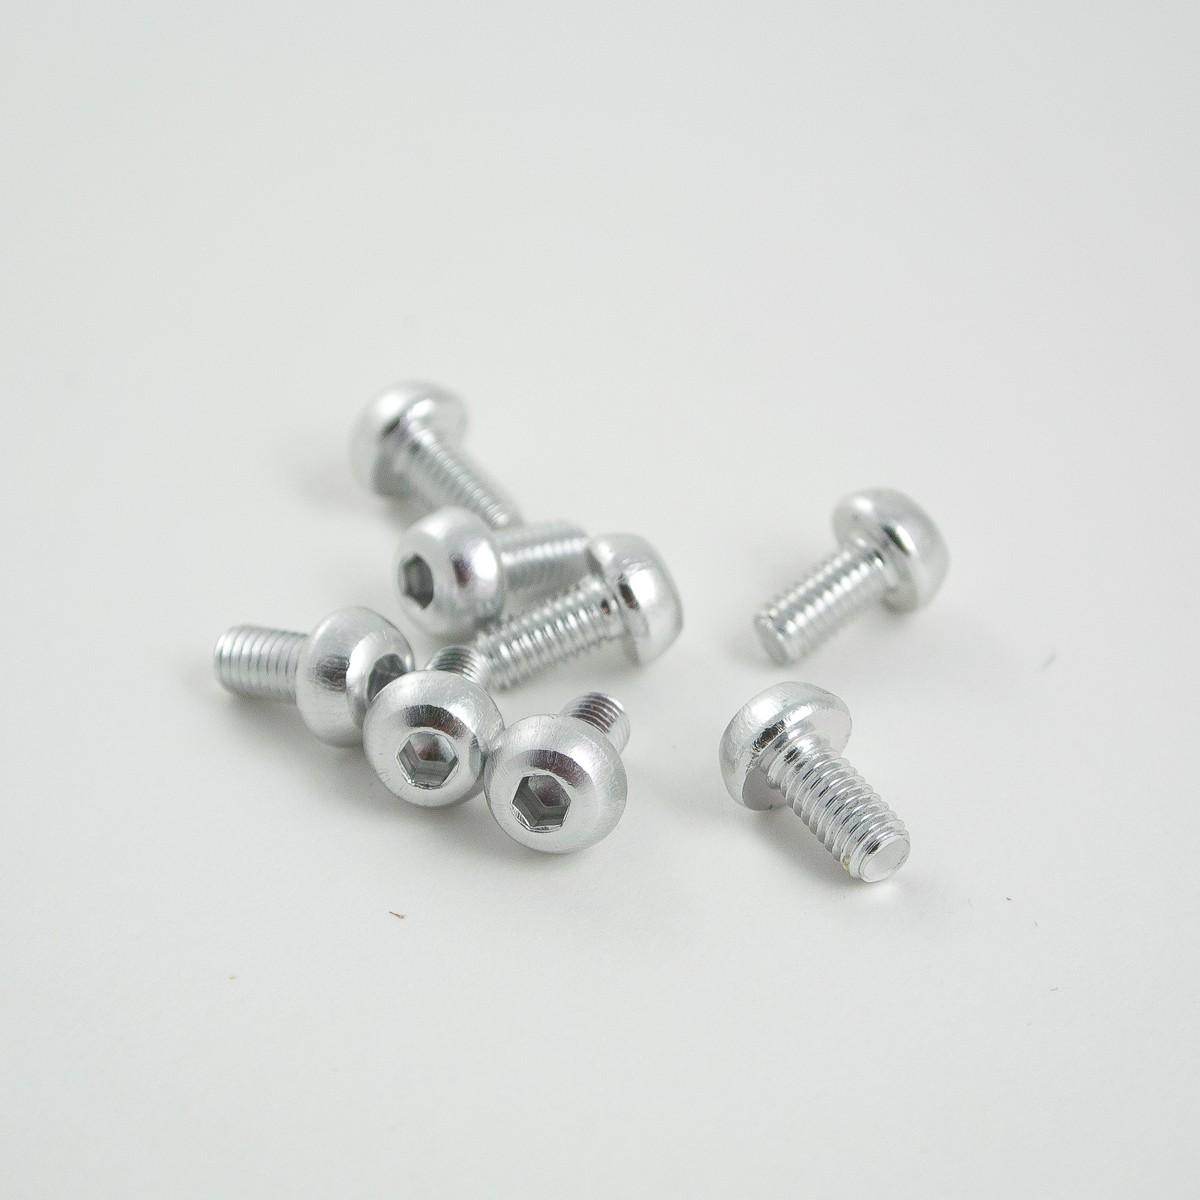 6mm M3 aluminium button head bolt 8pcs